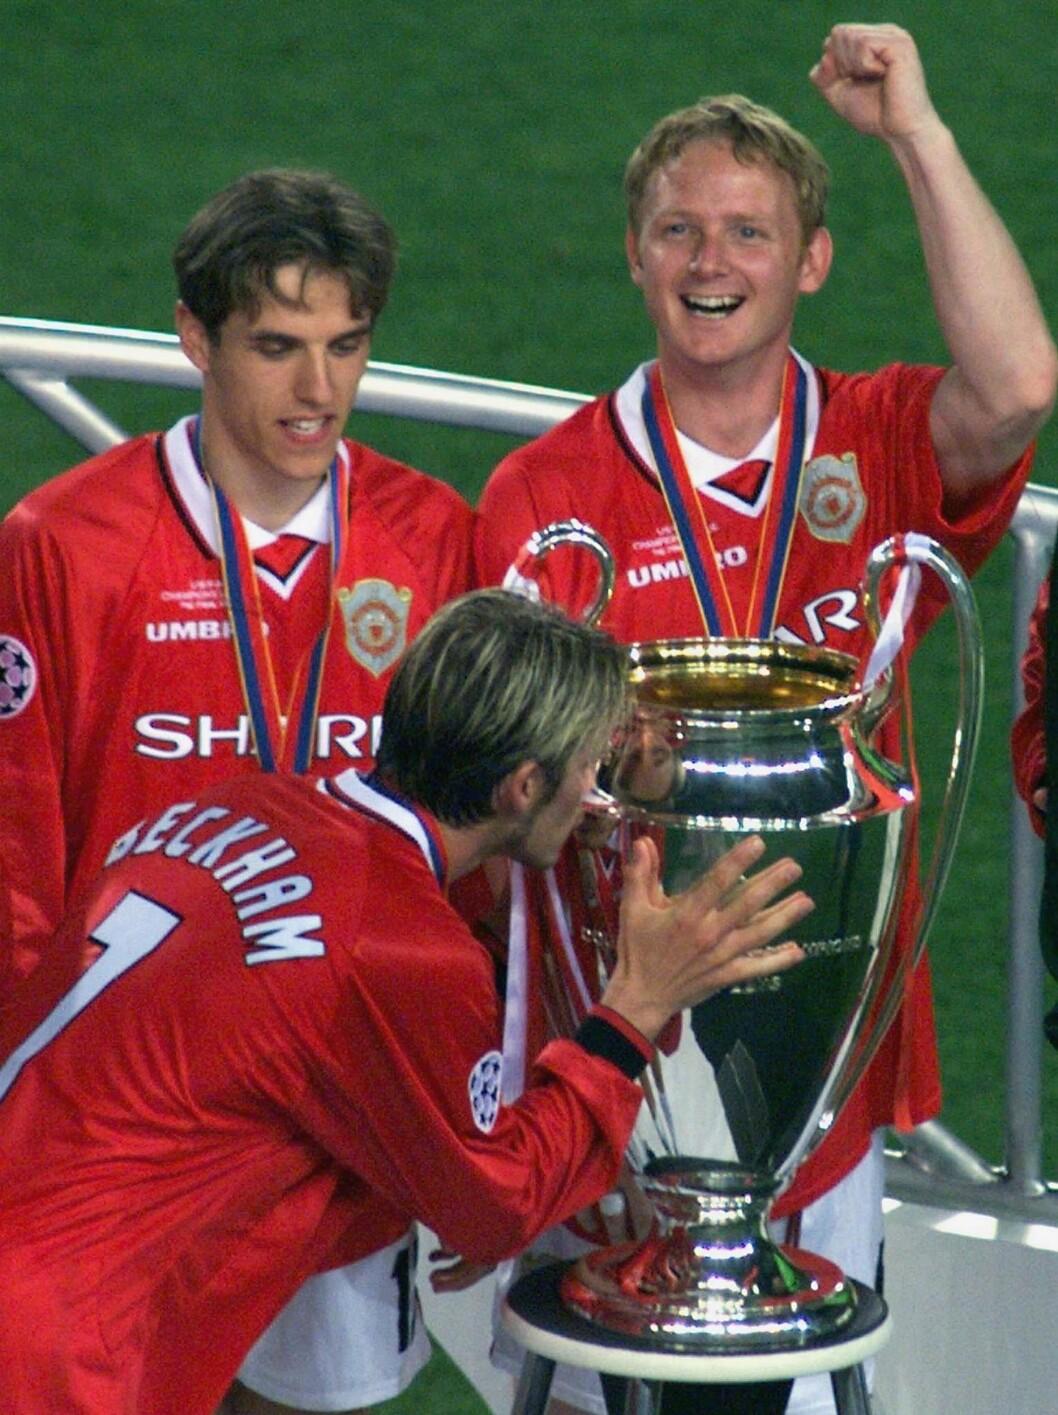 SUKSESS: I 1999 var David Beckham kaptein på det engelske fotballaget Manchester United, og sammen med lagkameratene sørget han for gull i både Premier League, FA-cupen og Champions League. Her med Phil Neville og David May etter at de vant sistnevnte turnering mot Bayern Munchen på Camp Nou  i Barcelona i mai 1999. Foto: NTB Scanpix